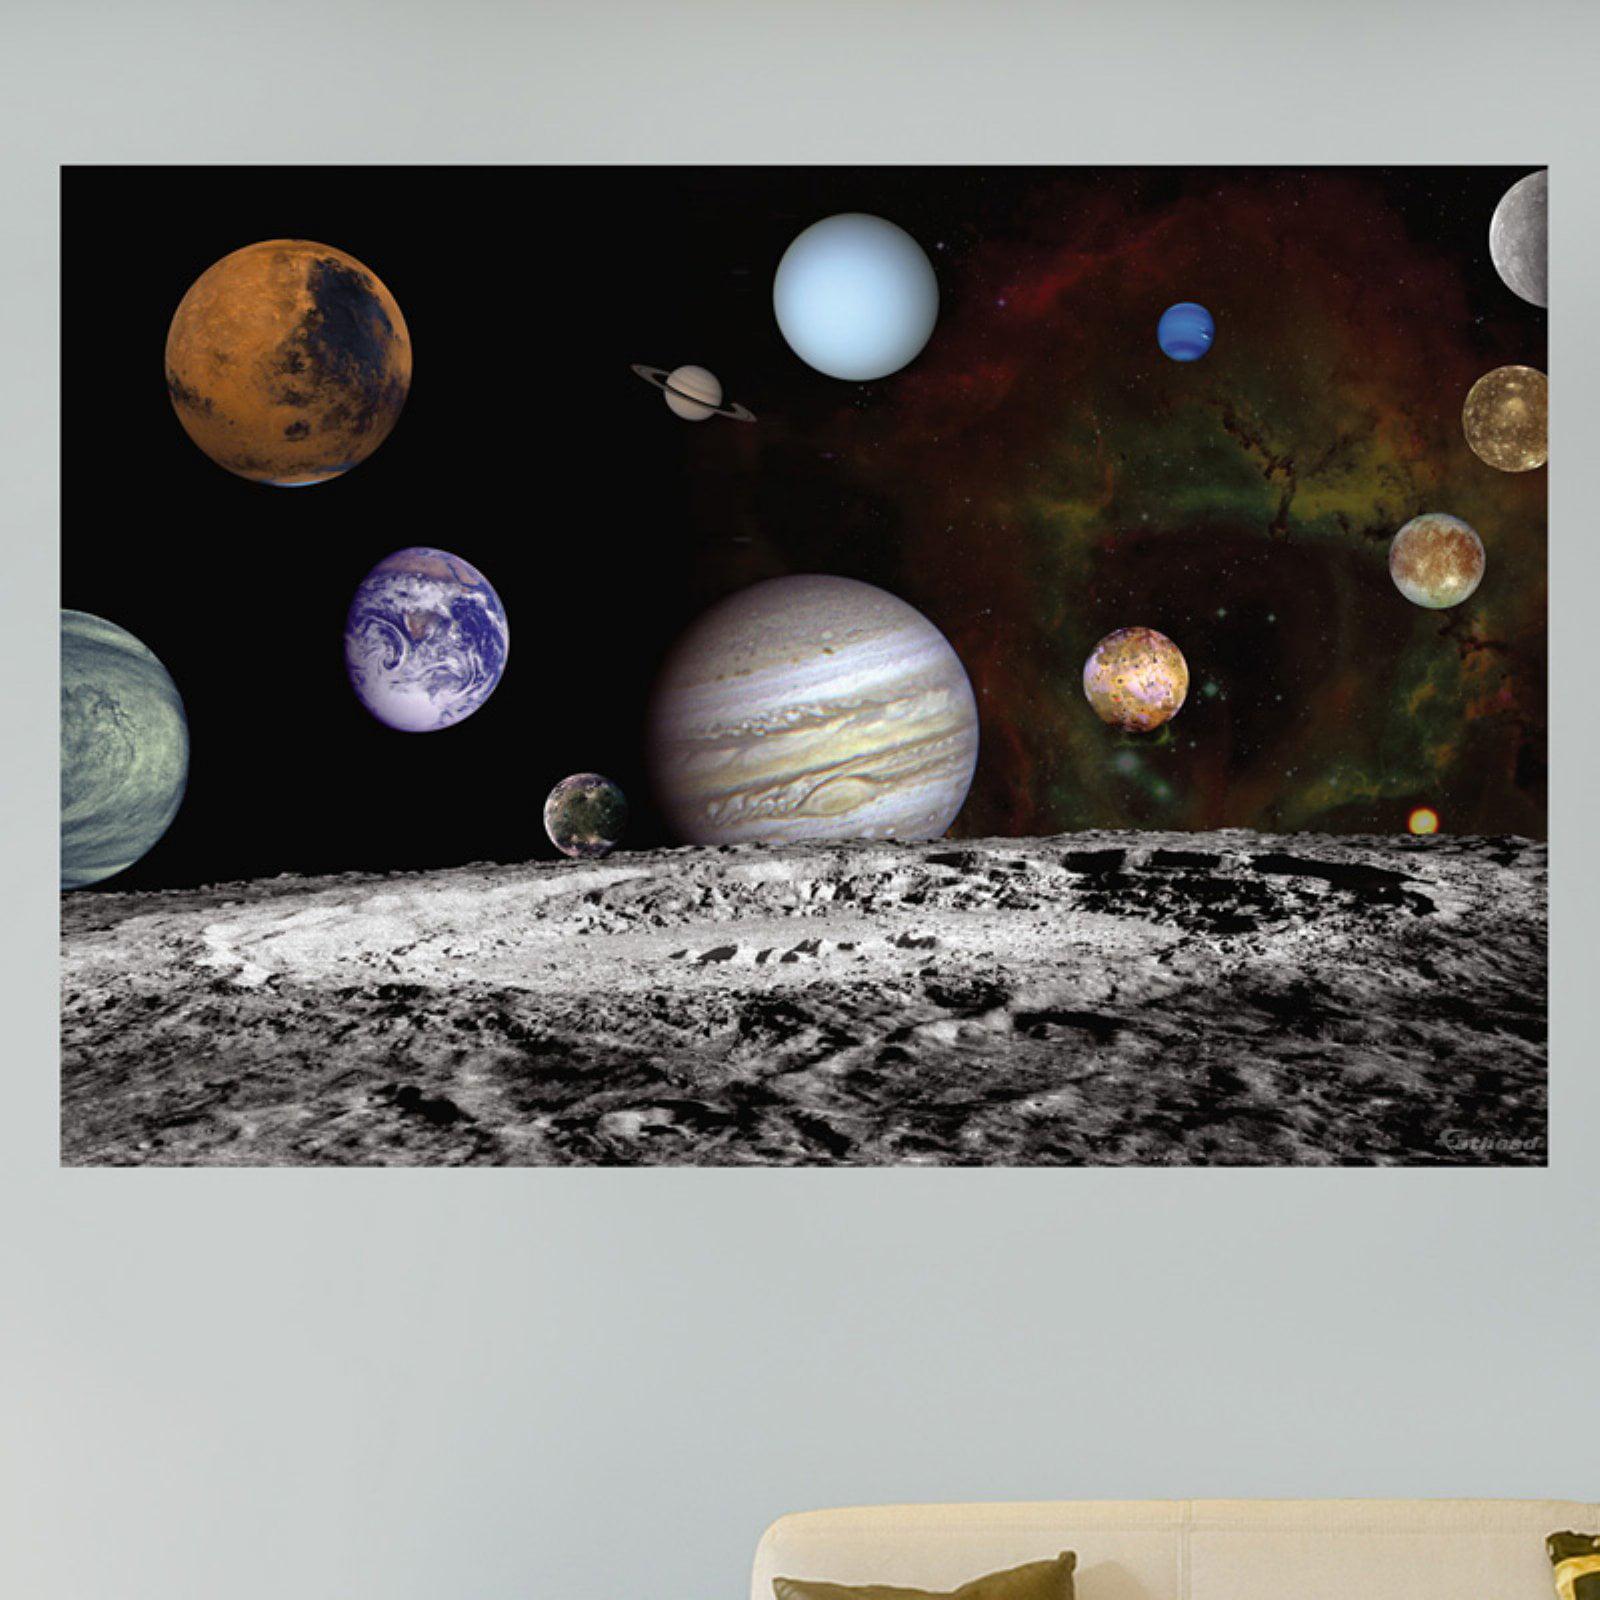 Fathead NASA Solar System Self-Adhesive Wall Decal